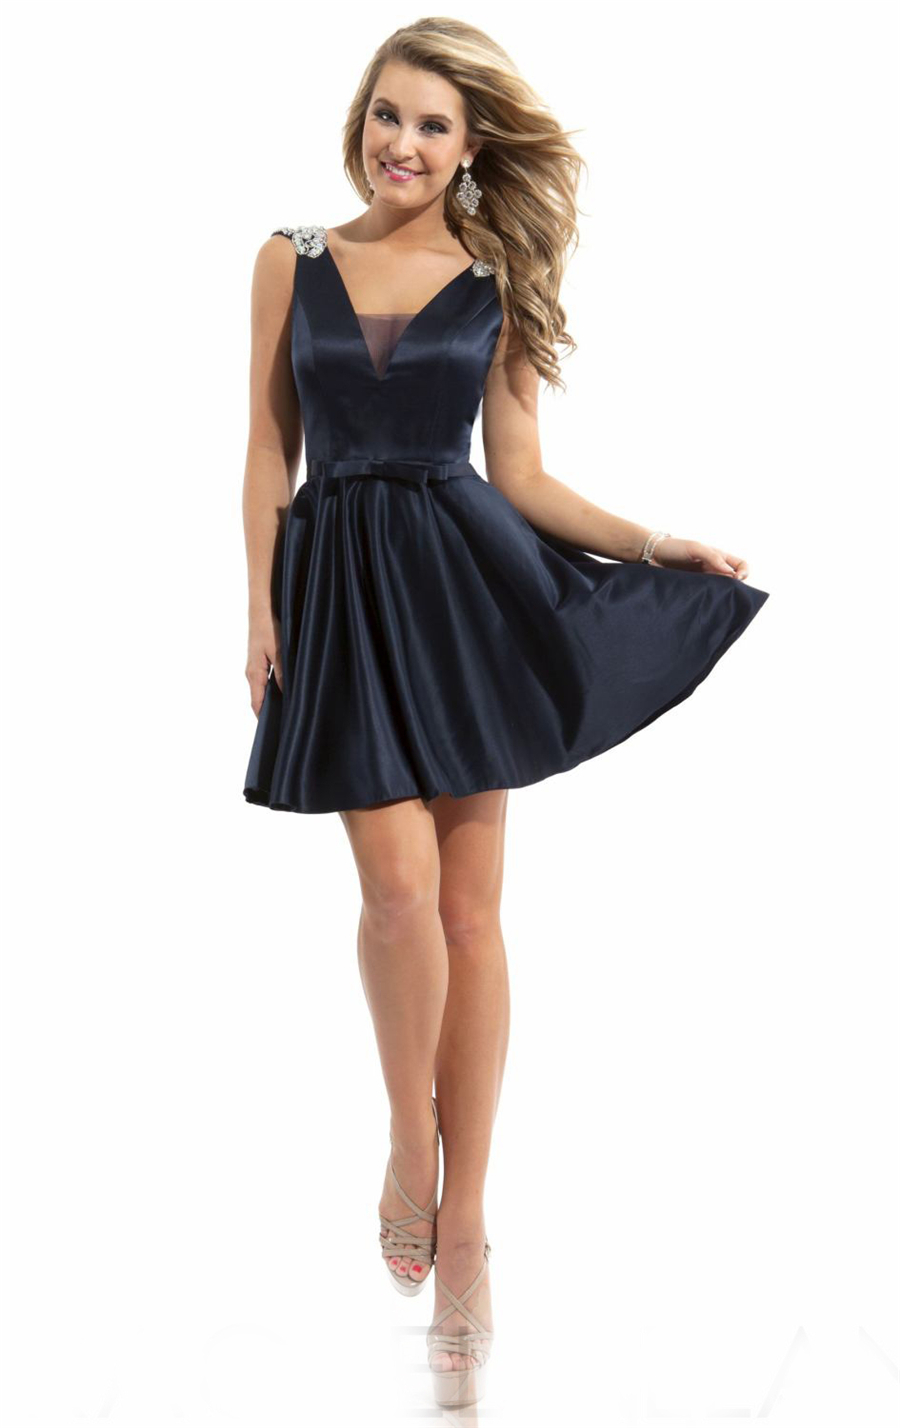 la mode des robes de france acheter robe satin pas cher. Black Bedroom Furniture Sets. Home Design Ideas